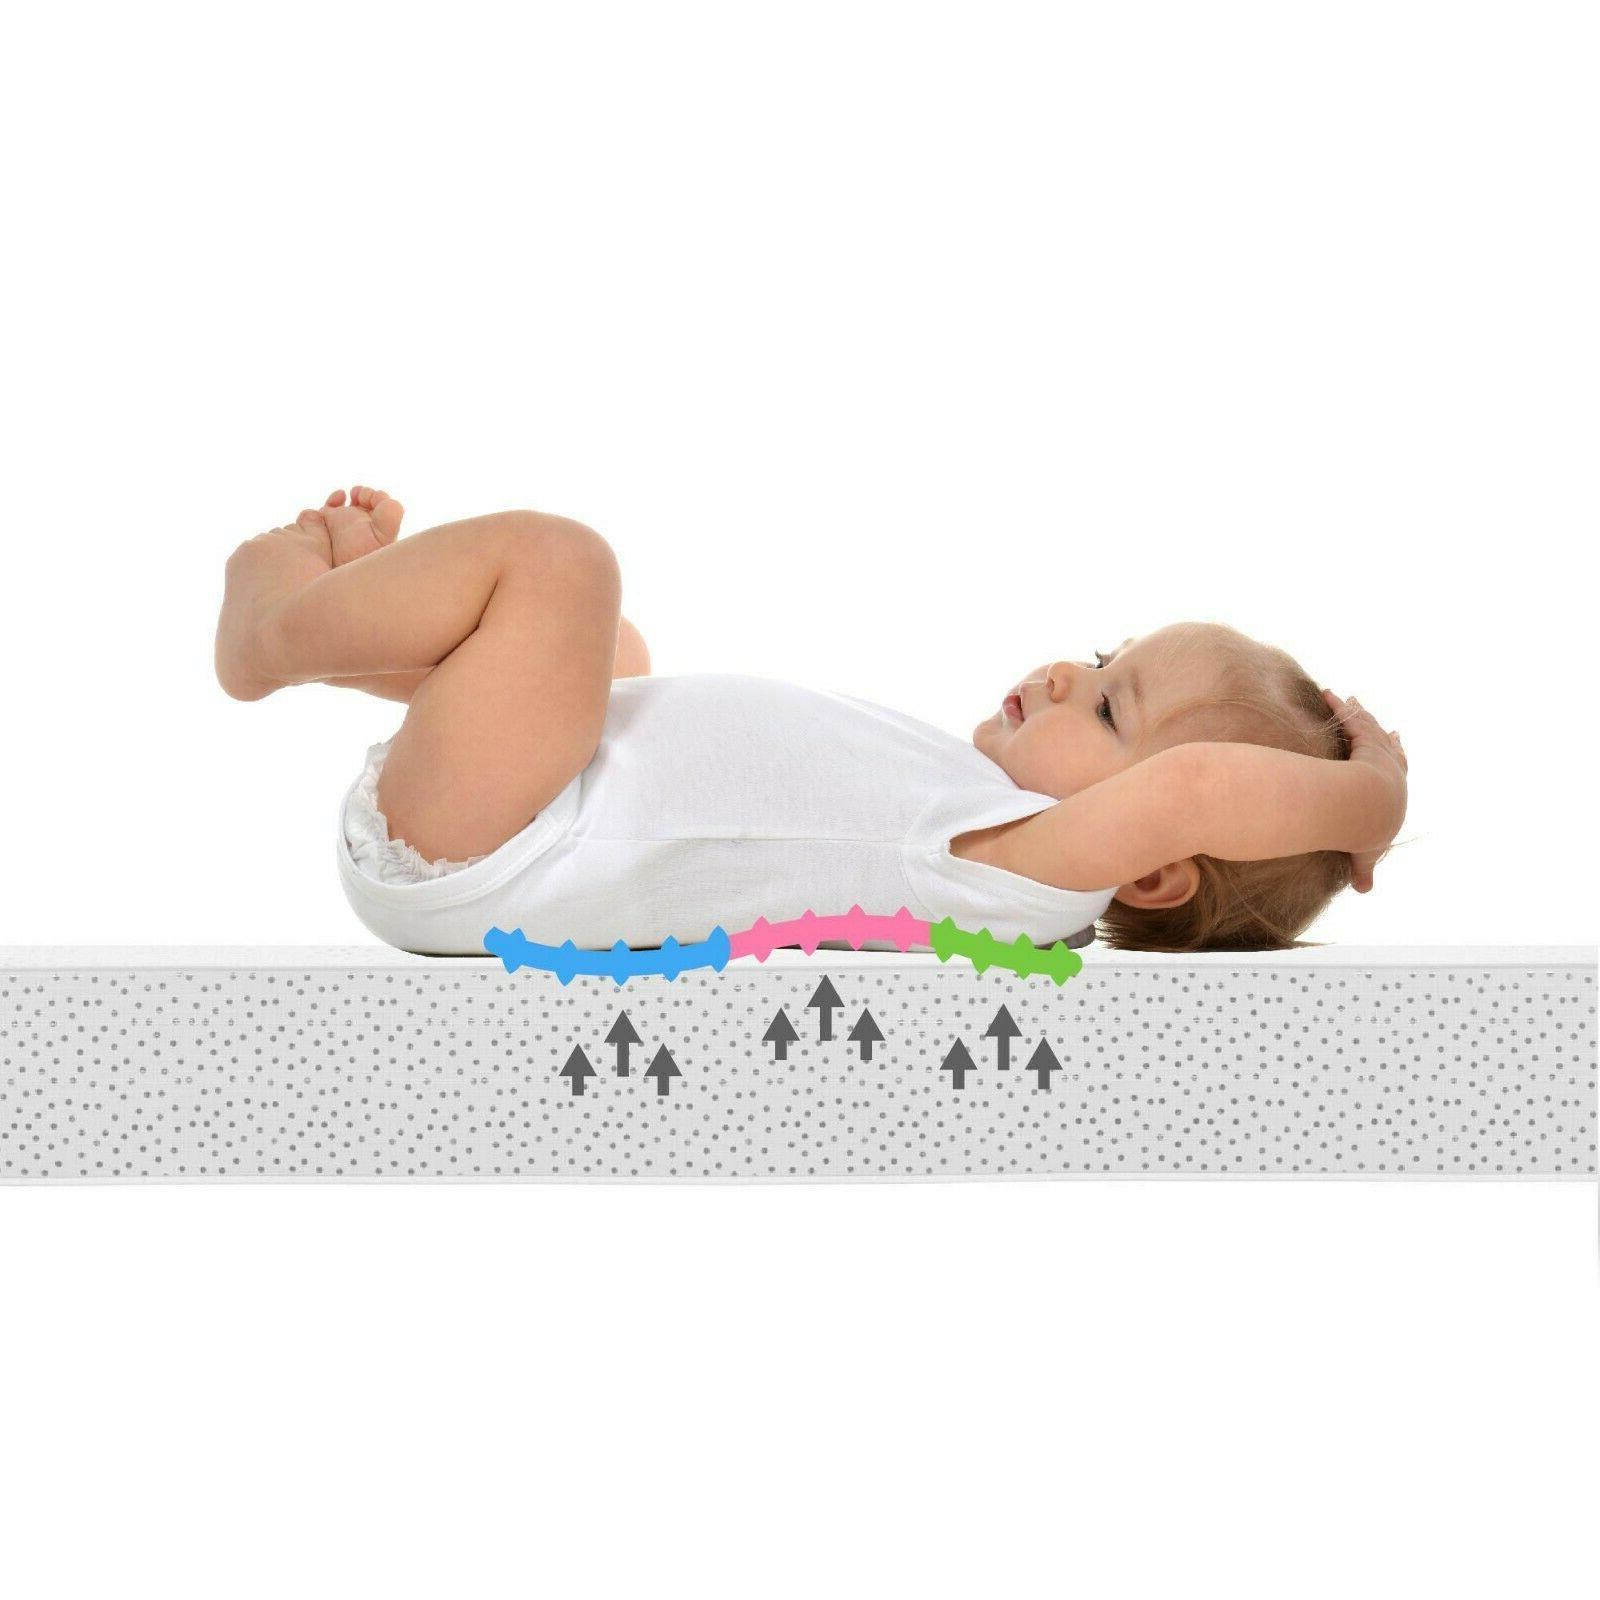 MATTRESS FOAM Bed Waterproof Comfort